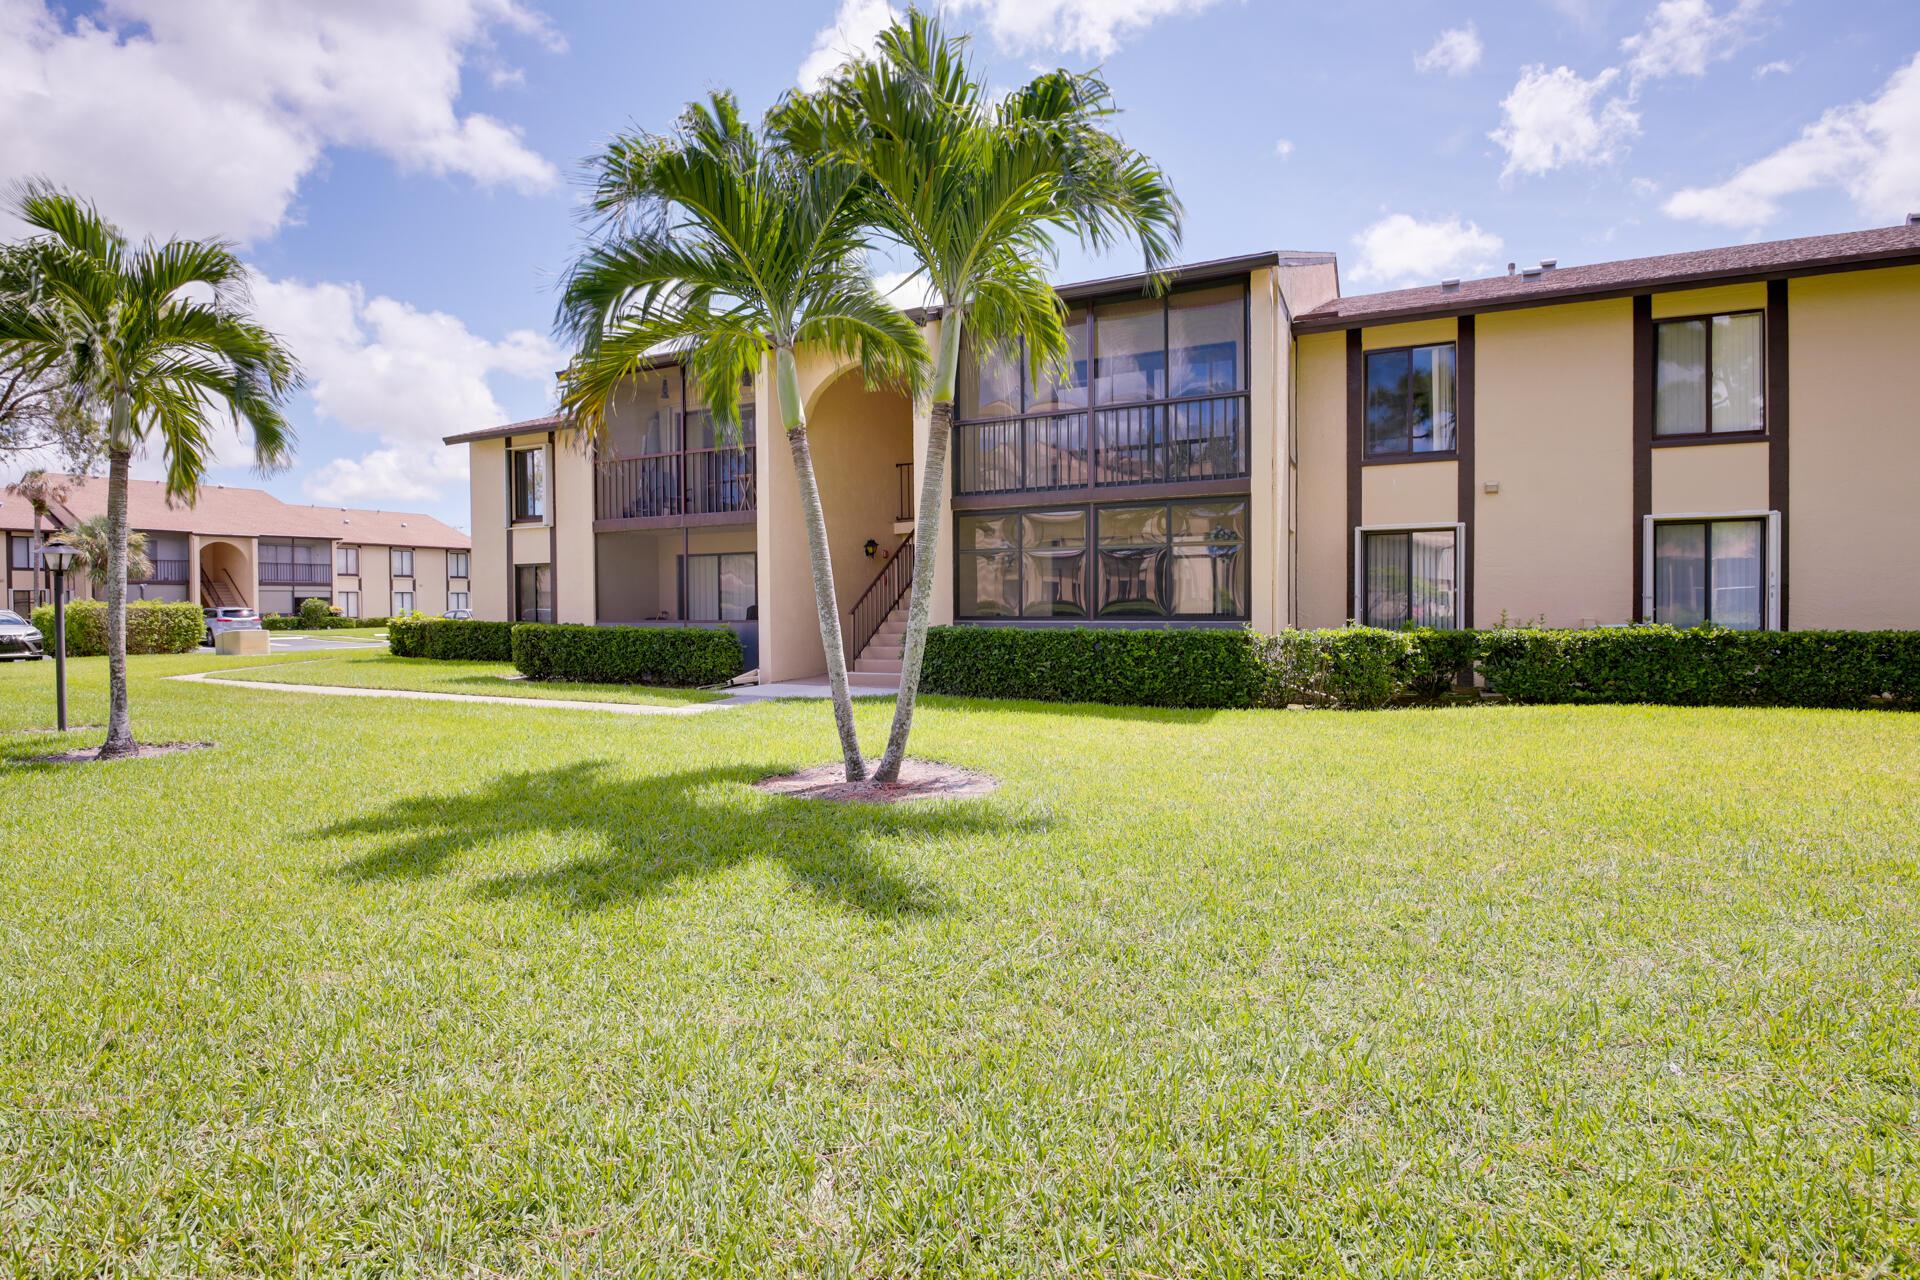 821 Sky Pine Unit G2, Greenacres, Florida 33415